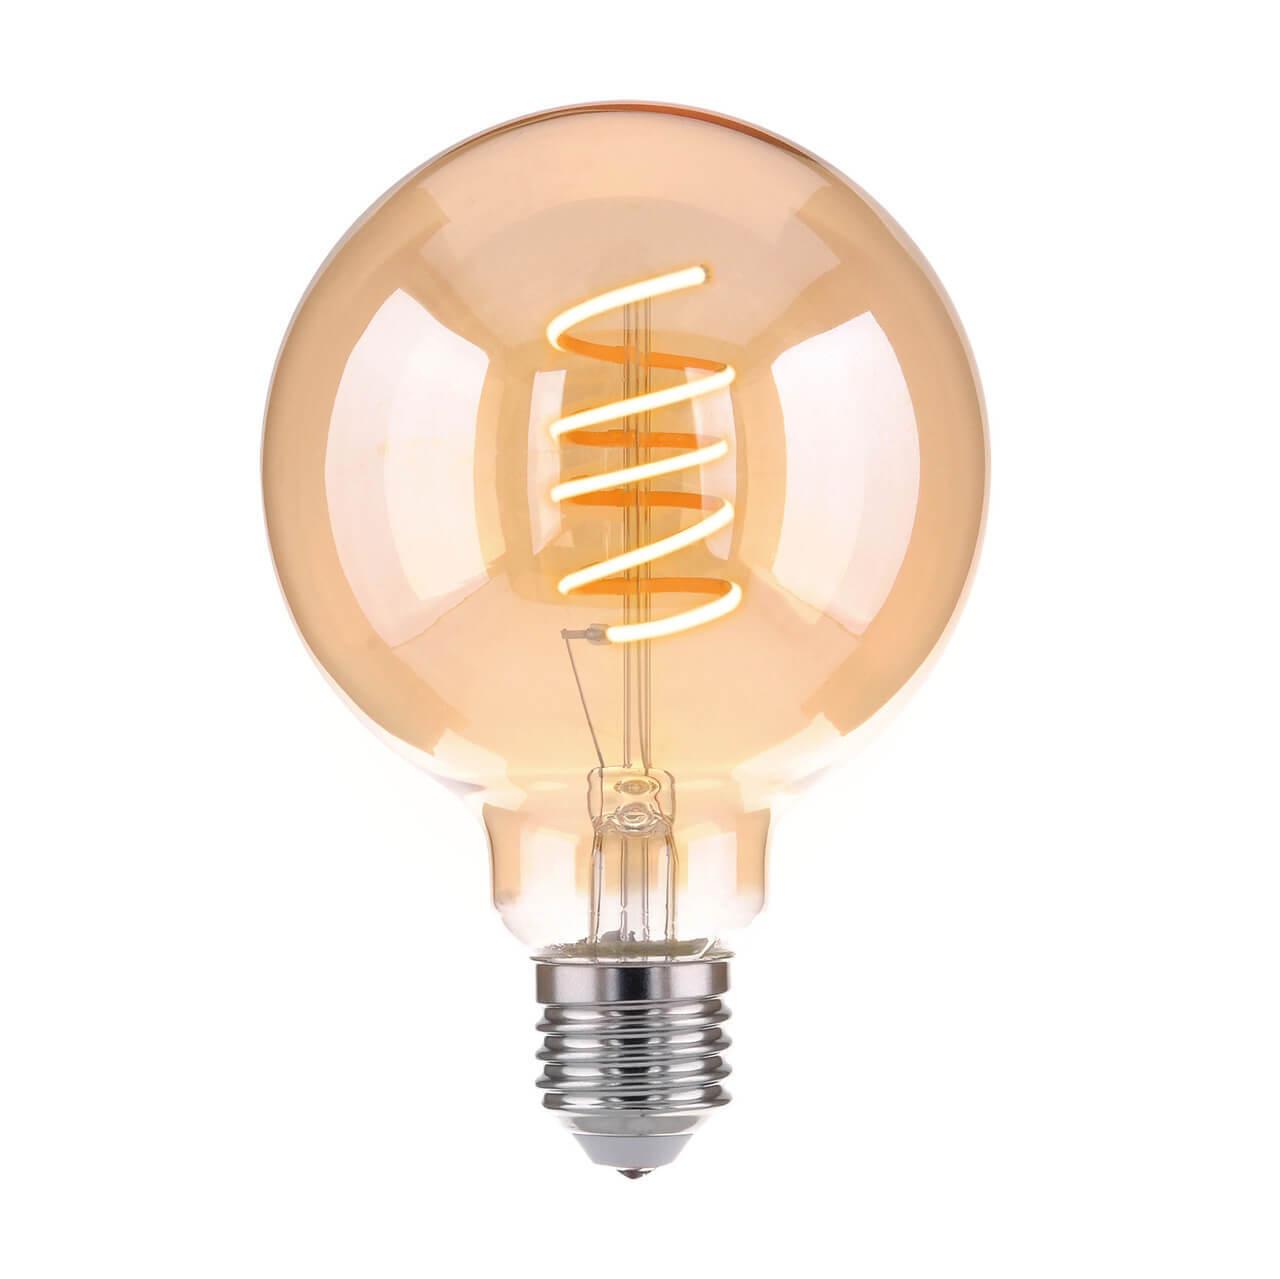 Лампа светодиодная филаментная Elektrostandard E27 8W 3300K золотистая 4690389125232